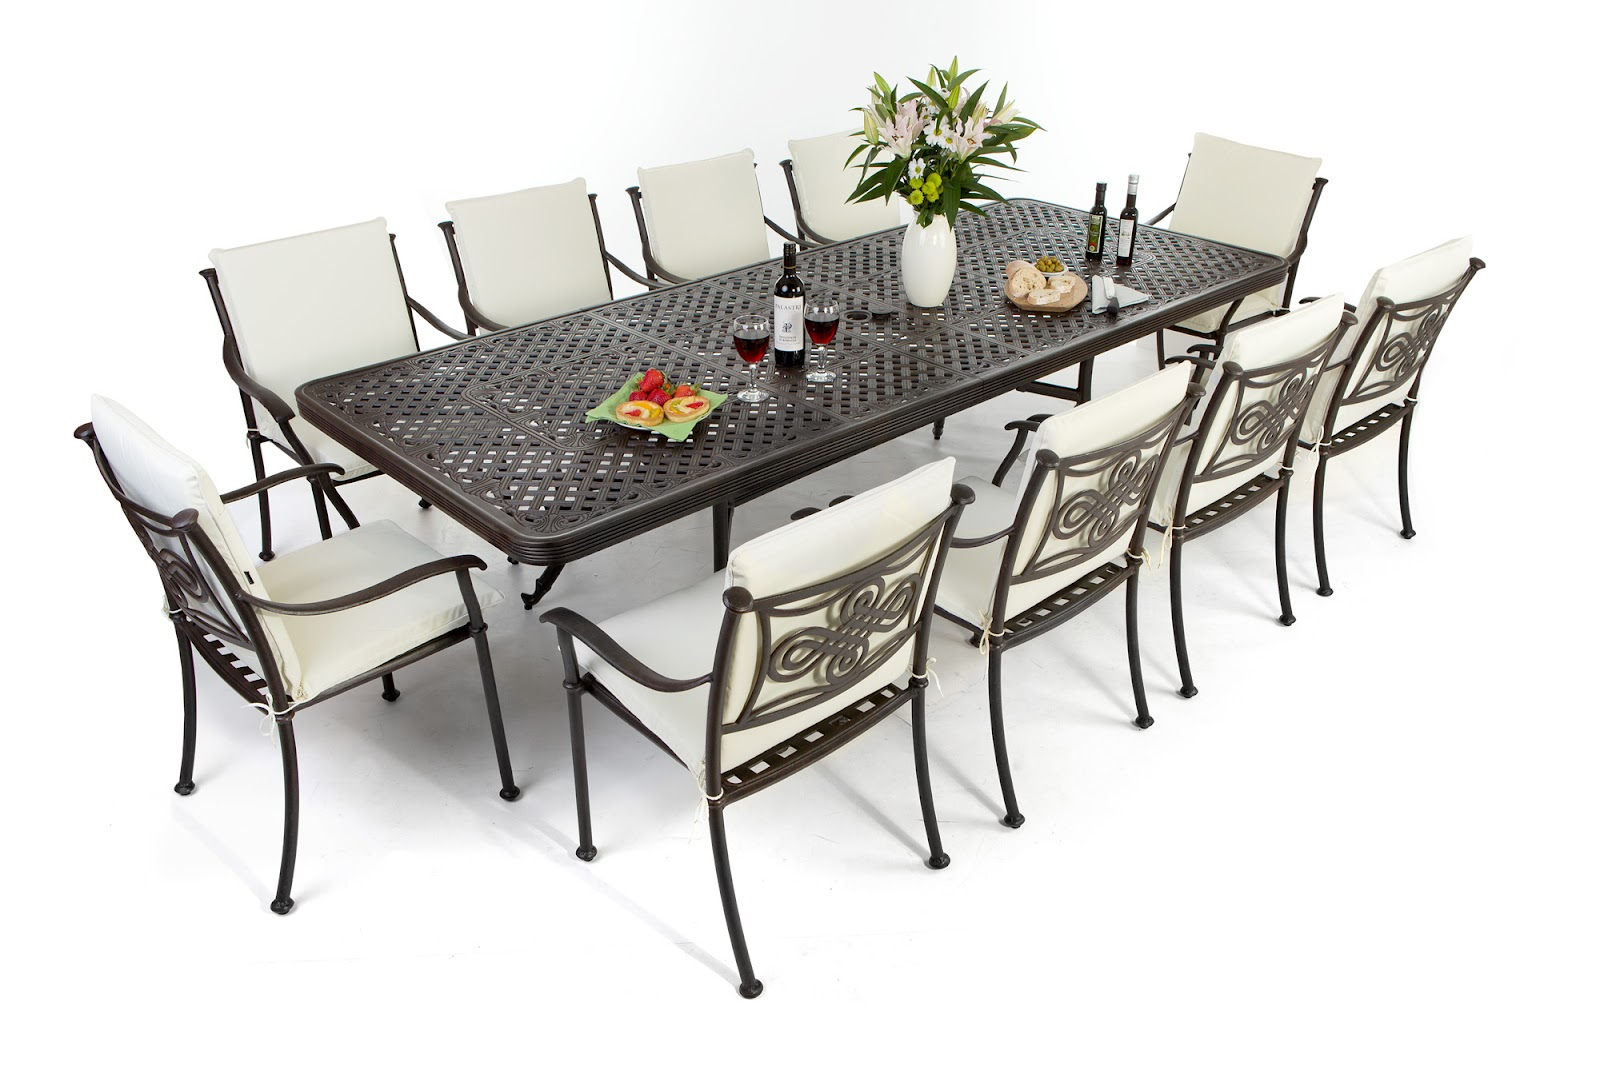 Outside Edge Garden Furniture Blog: The Versatile Rhodes ...